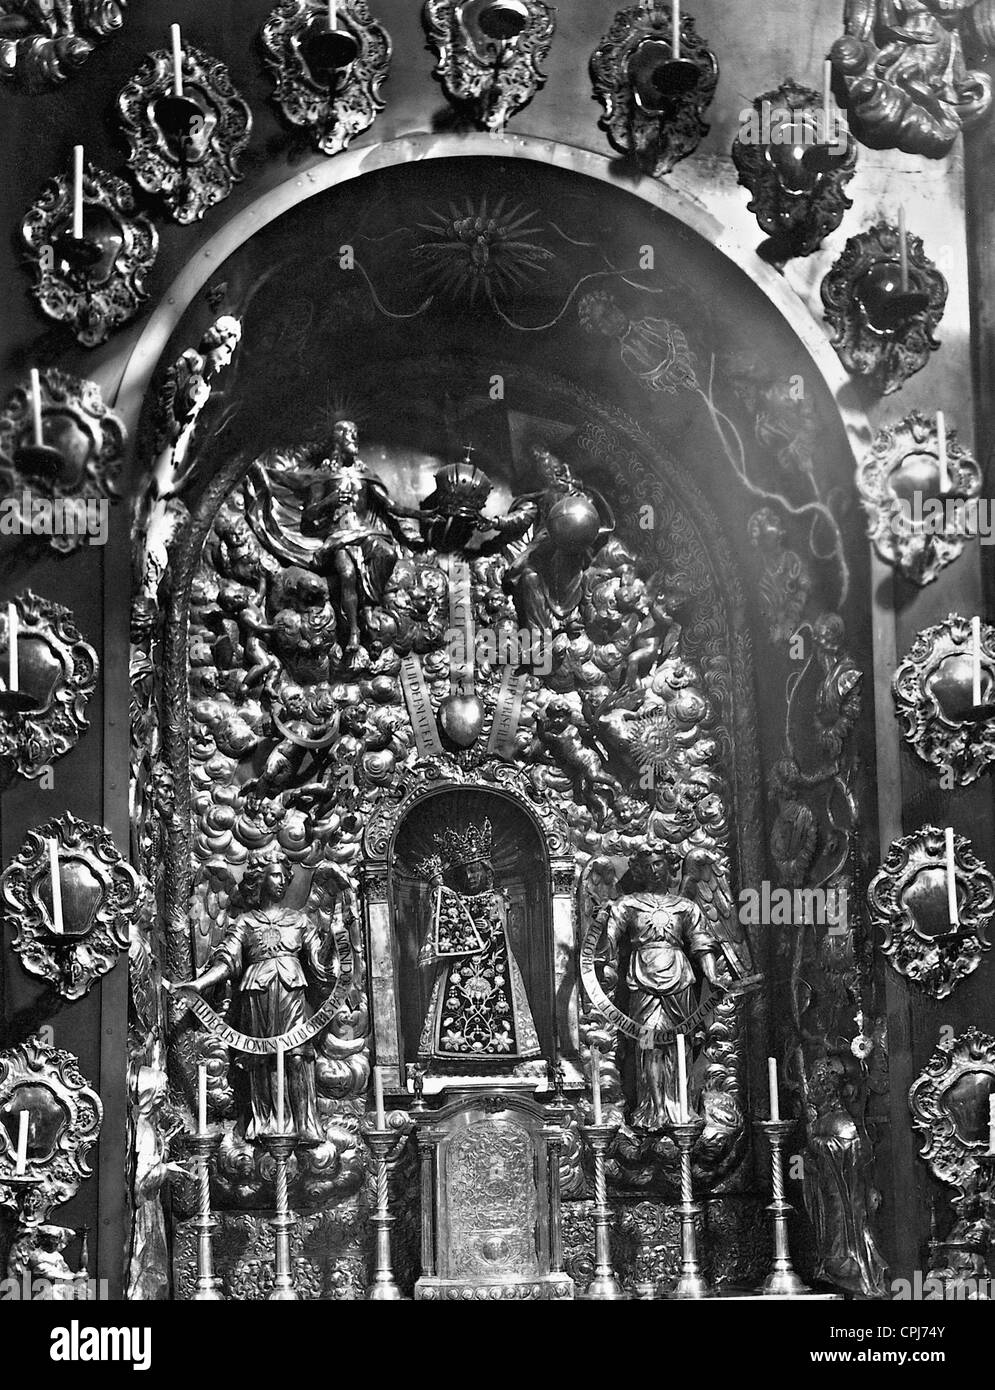 Black Madonna of Altoetting - Stock Image